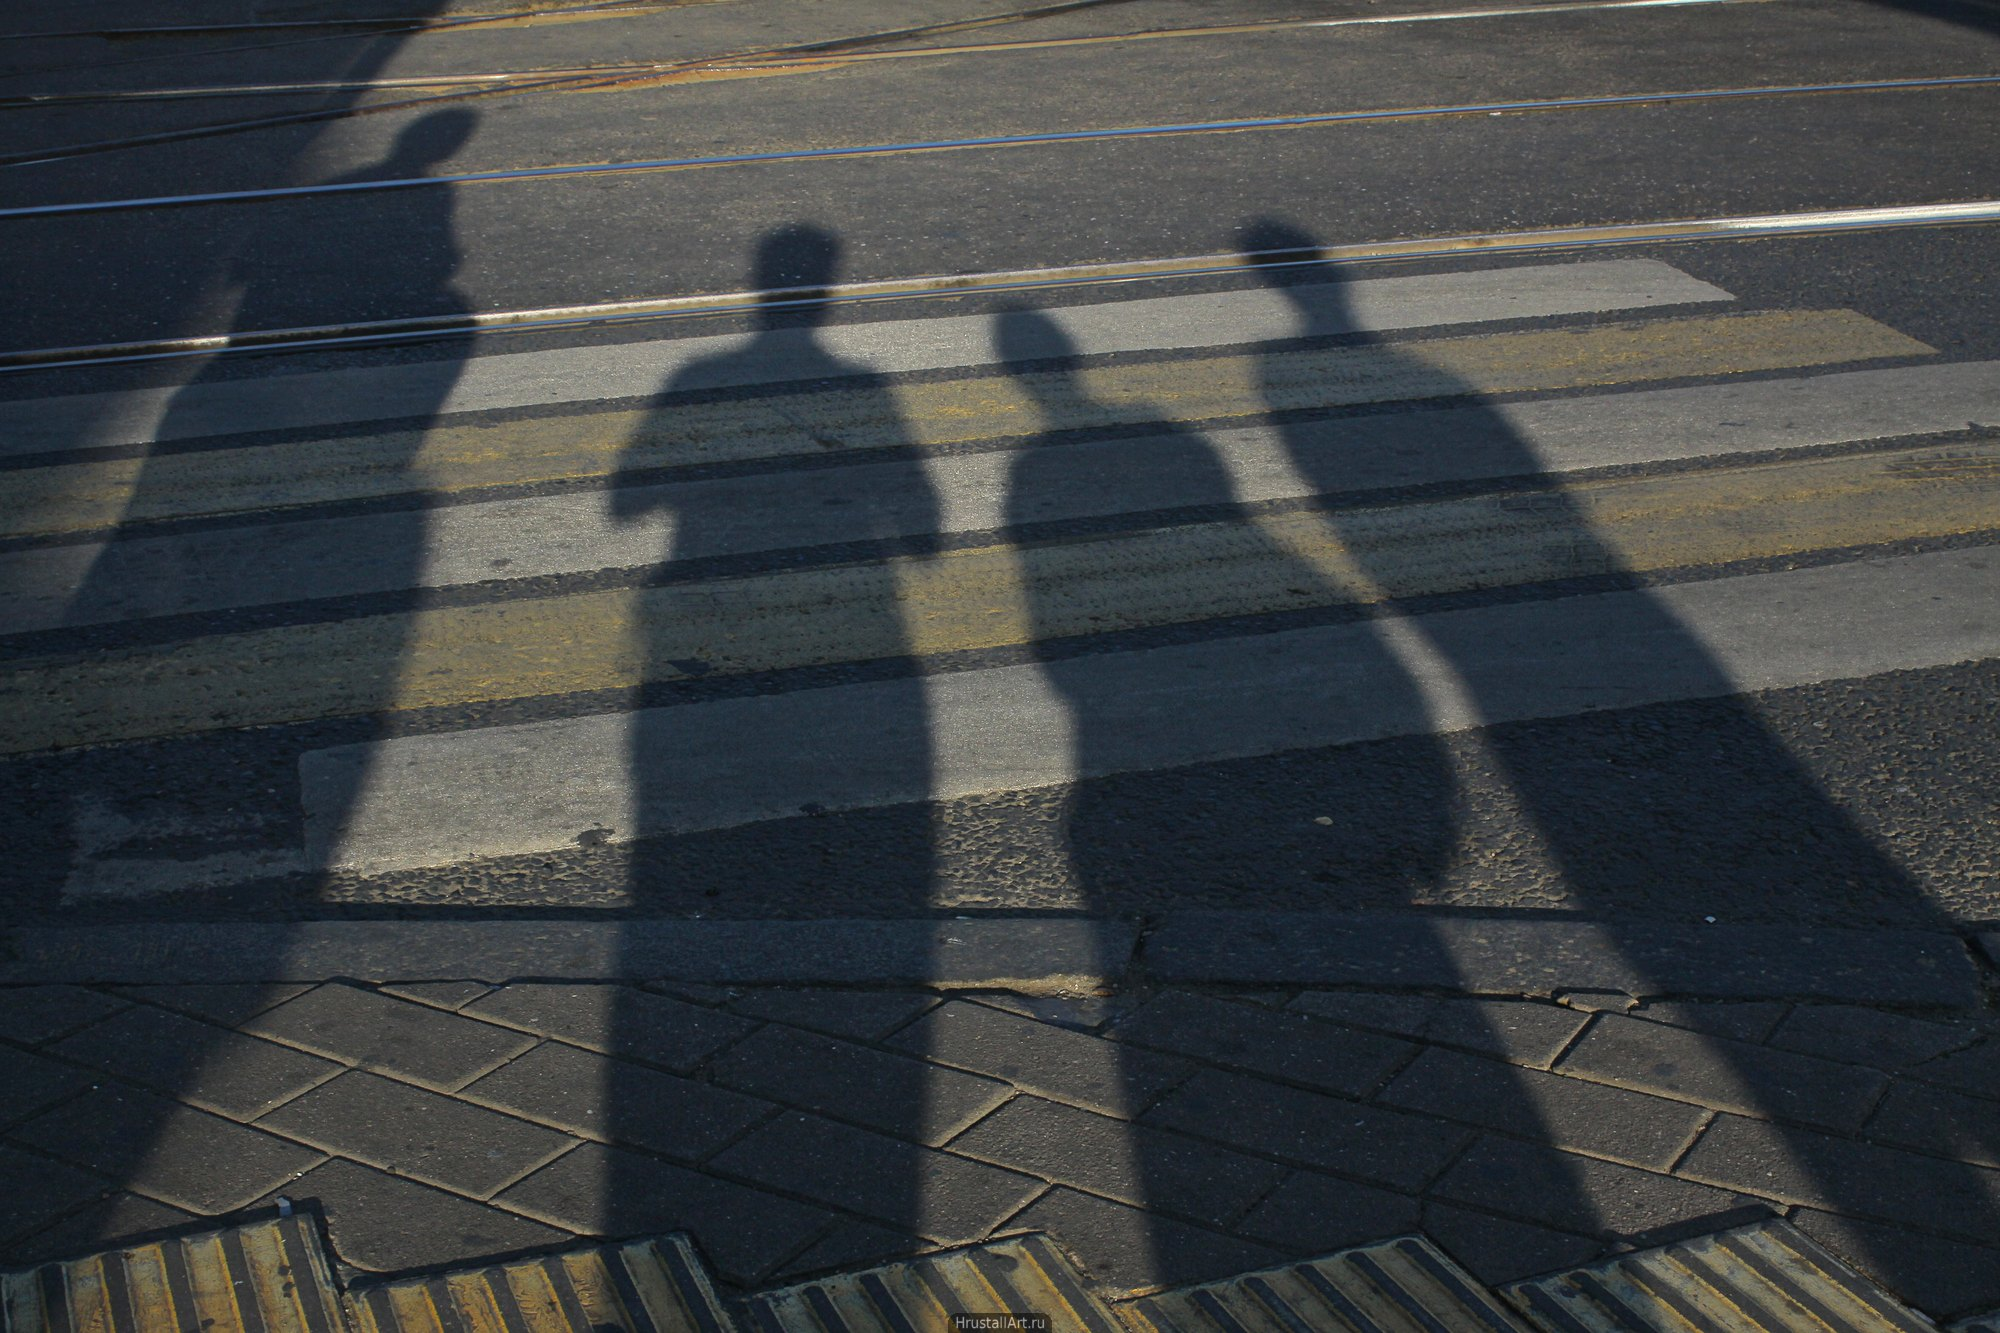 Тени людей на пешеходном переходе.